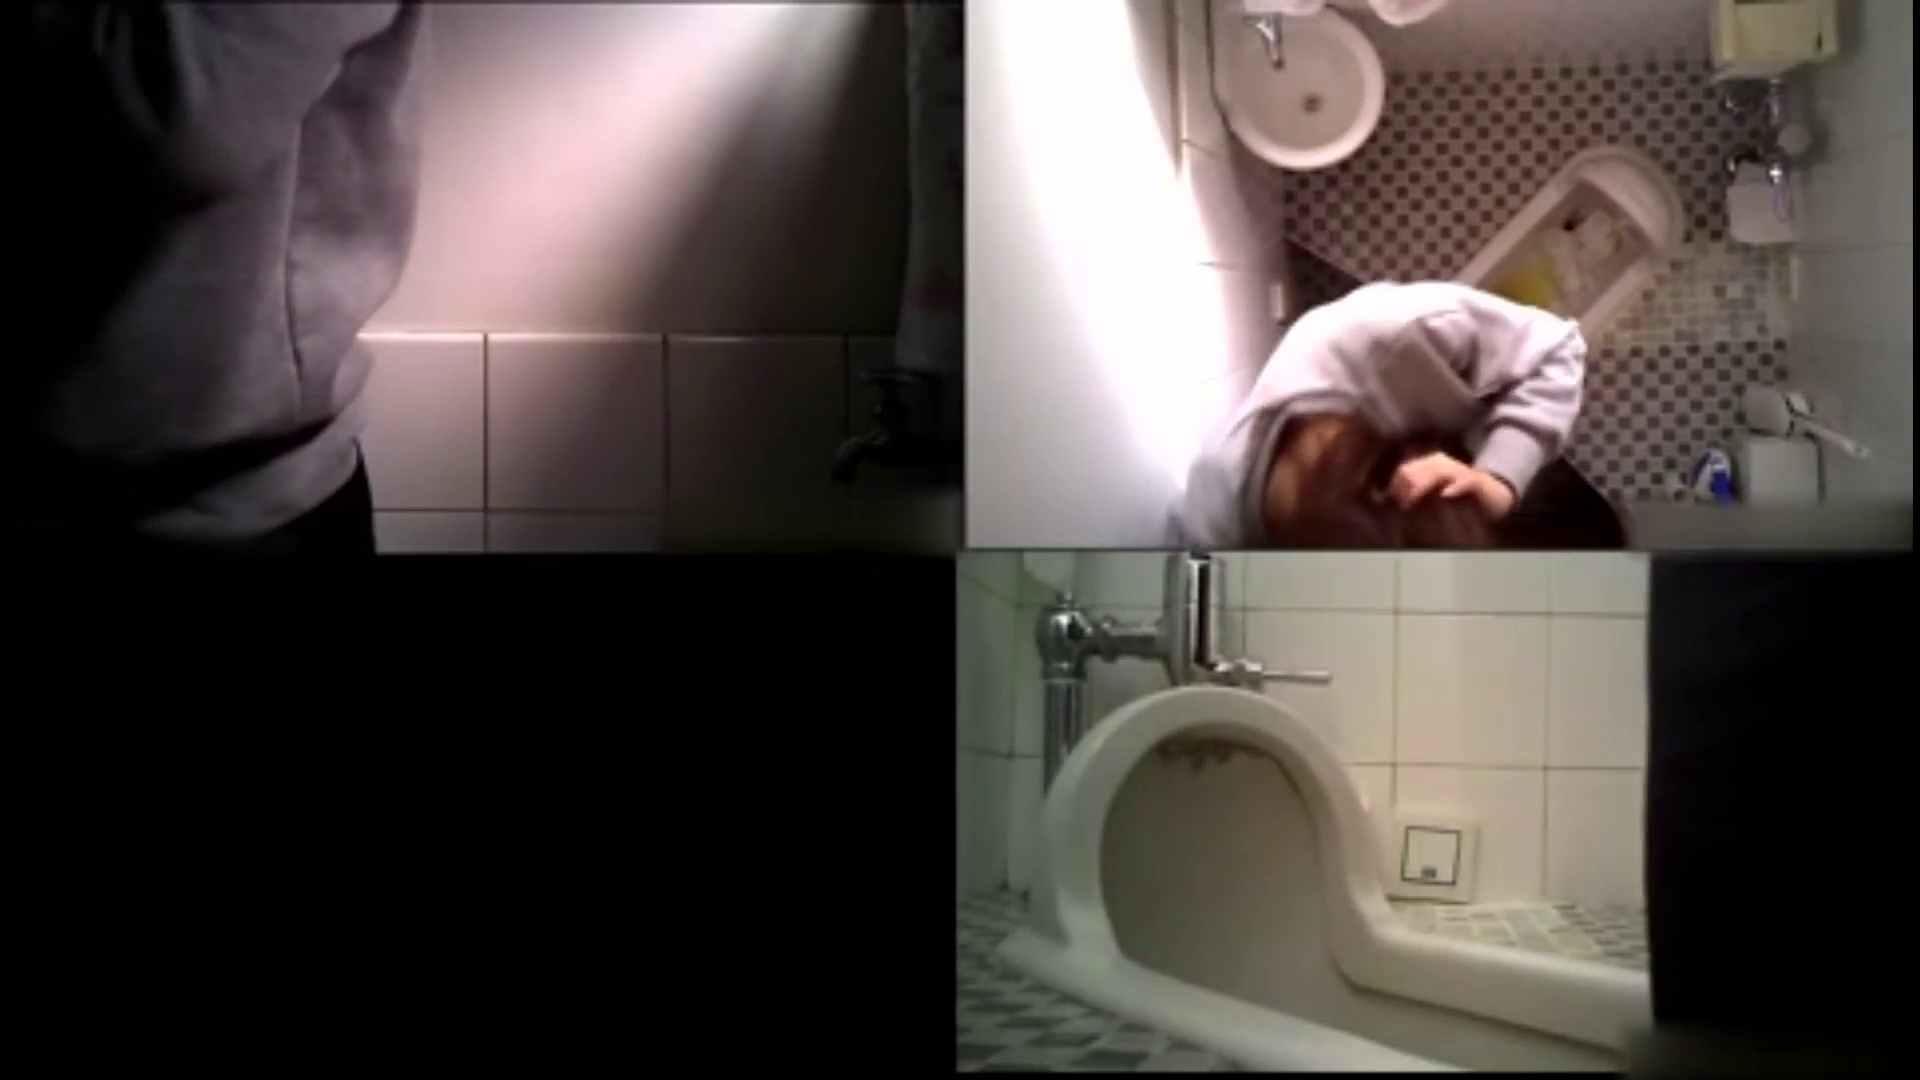 Vol.05 花の女子大生 トイレ恥態 進化系マルチアングル!! トイレ中   女子大生達のヌード  38連発 25